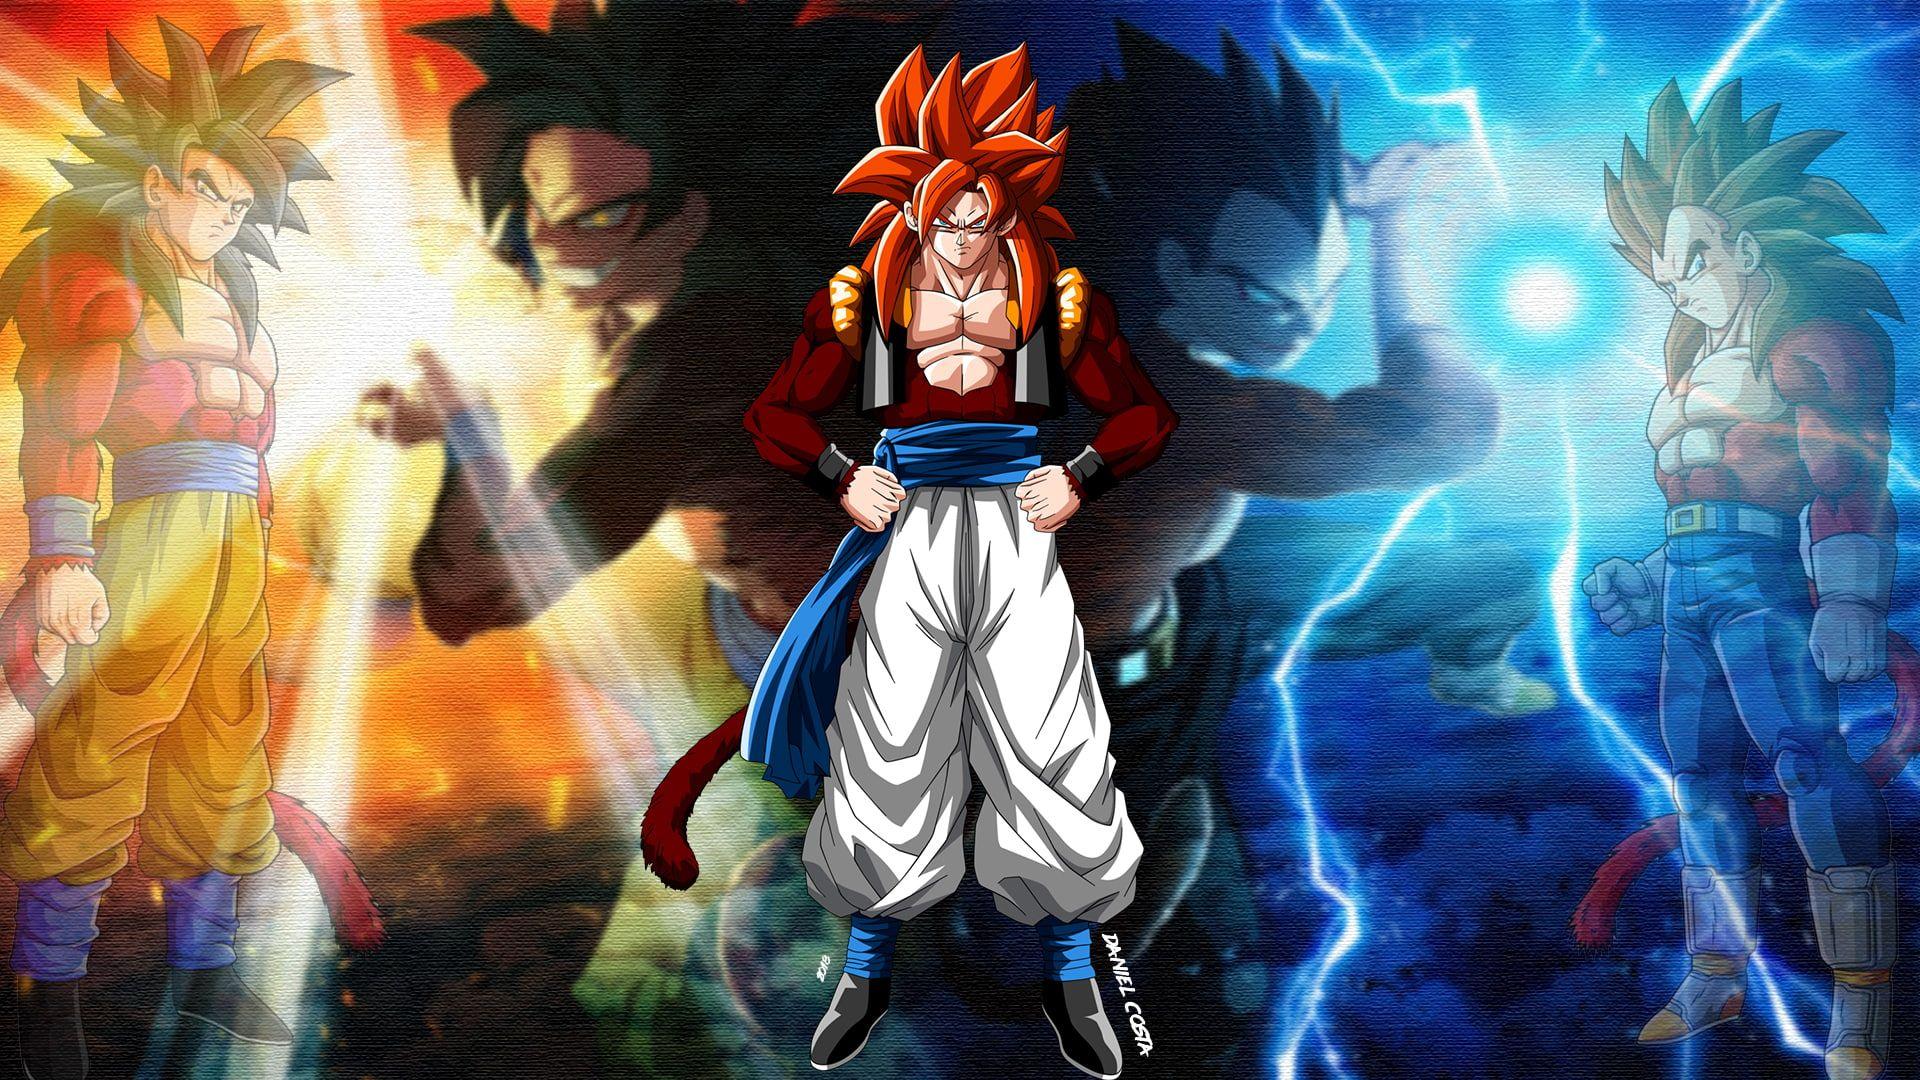 Dragon Ball Dragon Ball Gt Gogeta Son Goku Vegeta 1080p Wallpaper Hdwallpaper Desktop In 2020 Dragon Ball Gt Dragon Ball Dragon